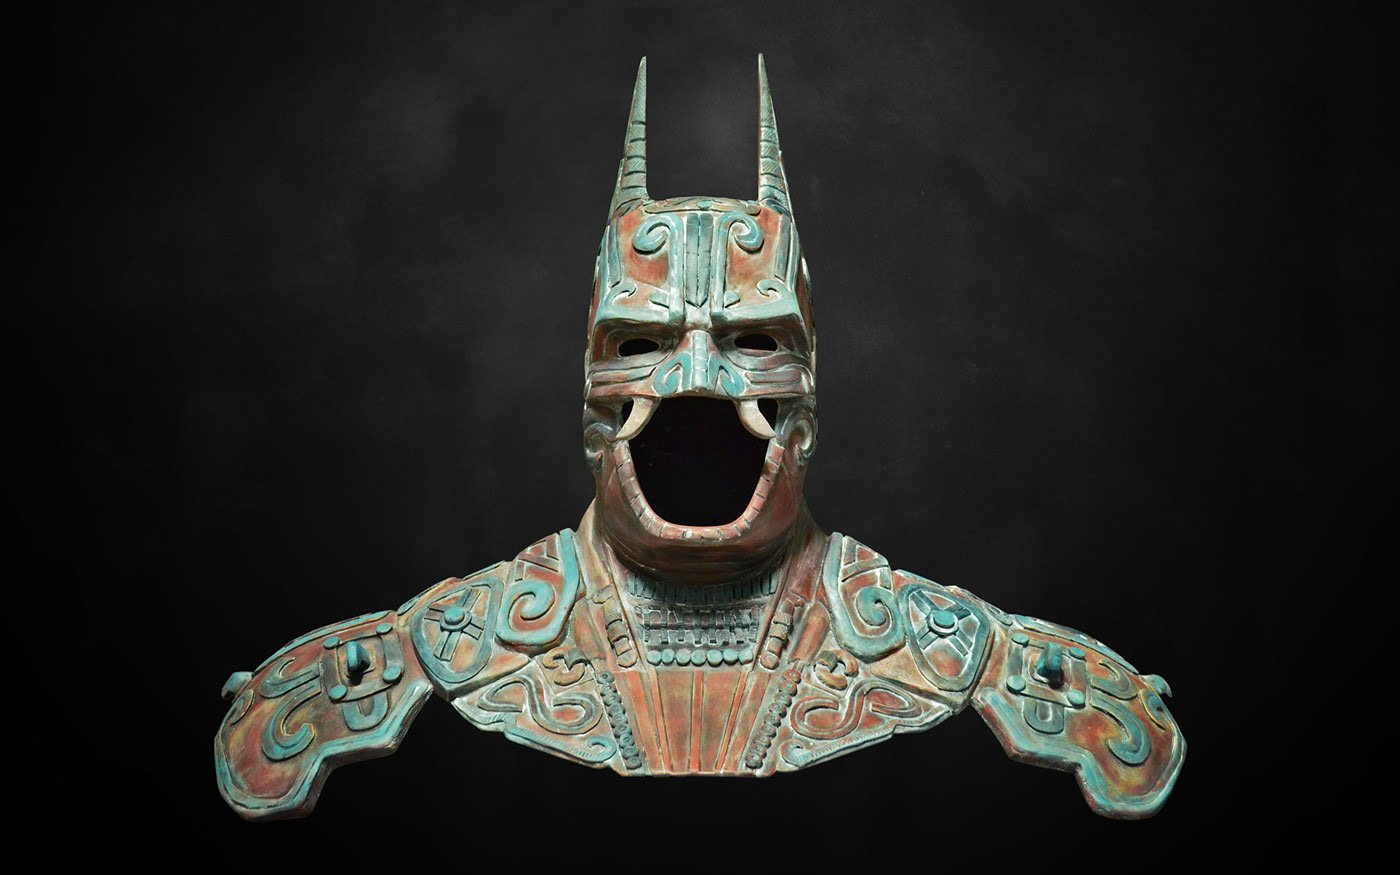 Batman Existed in Mesoamerican Mythology